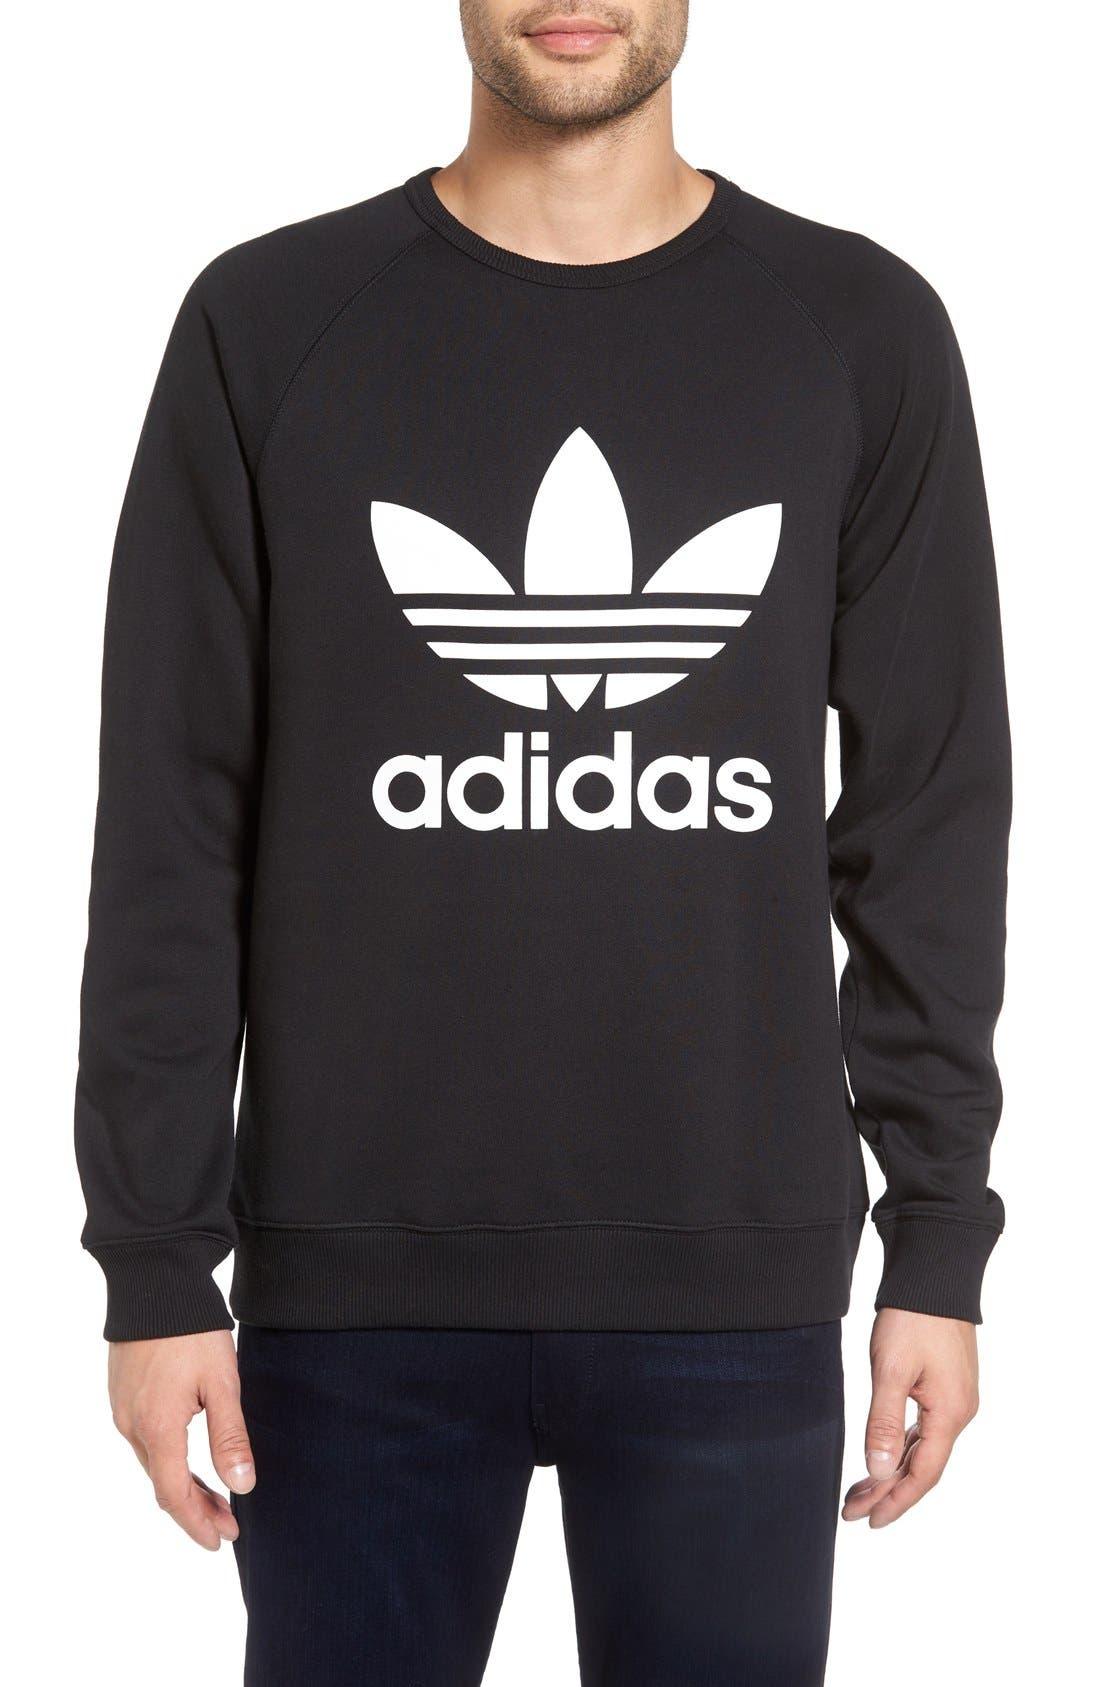 adidas Originals Slim Fit Trefoil Logo Crewneck Sweatshirt